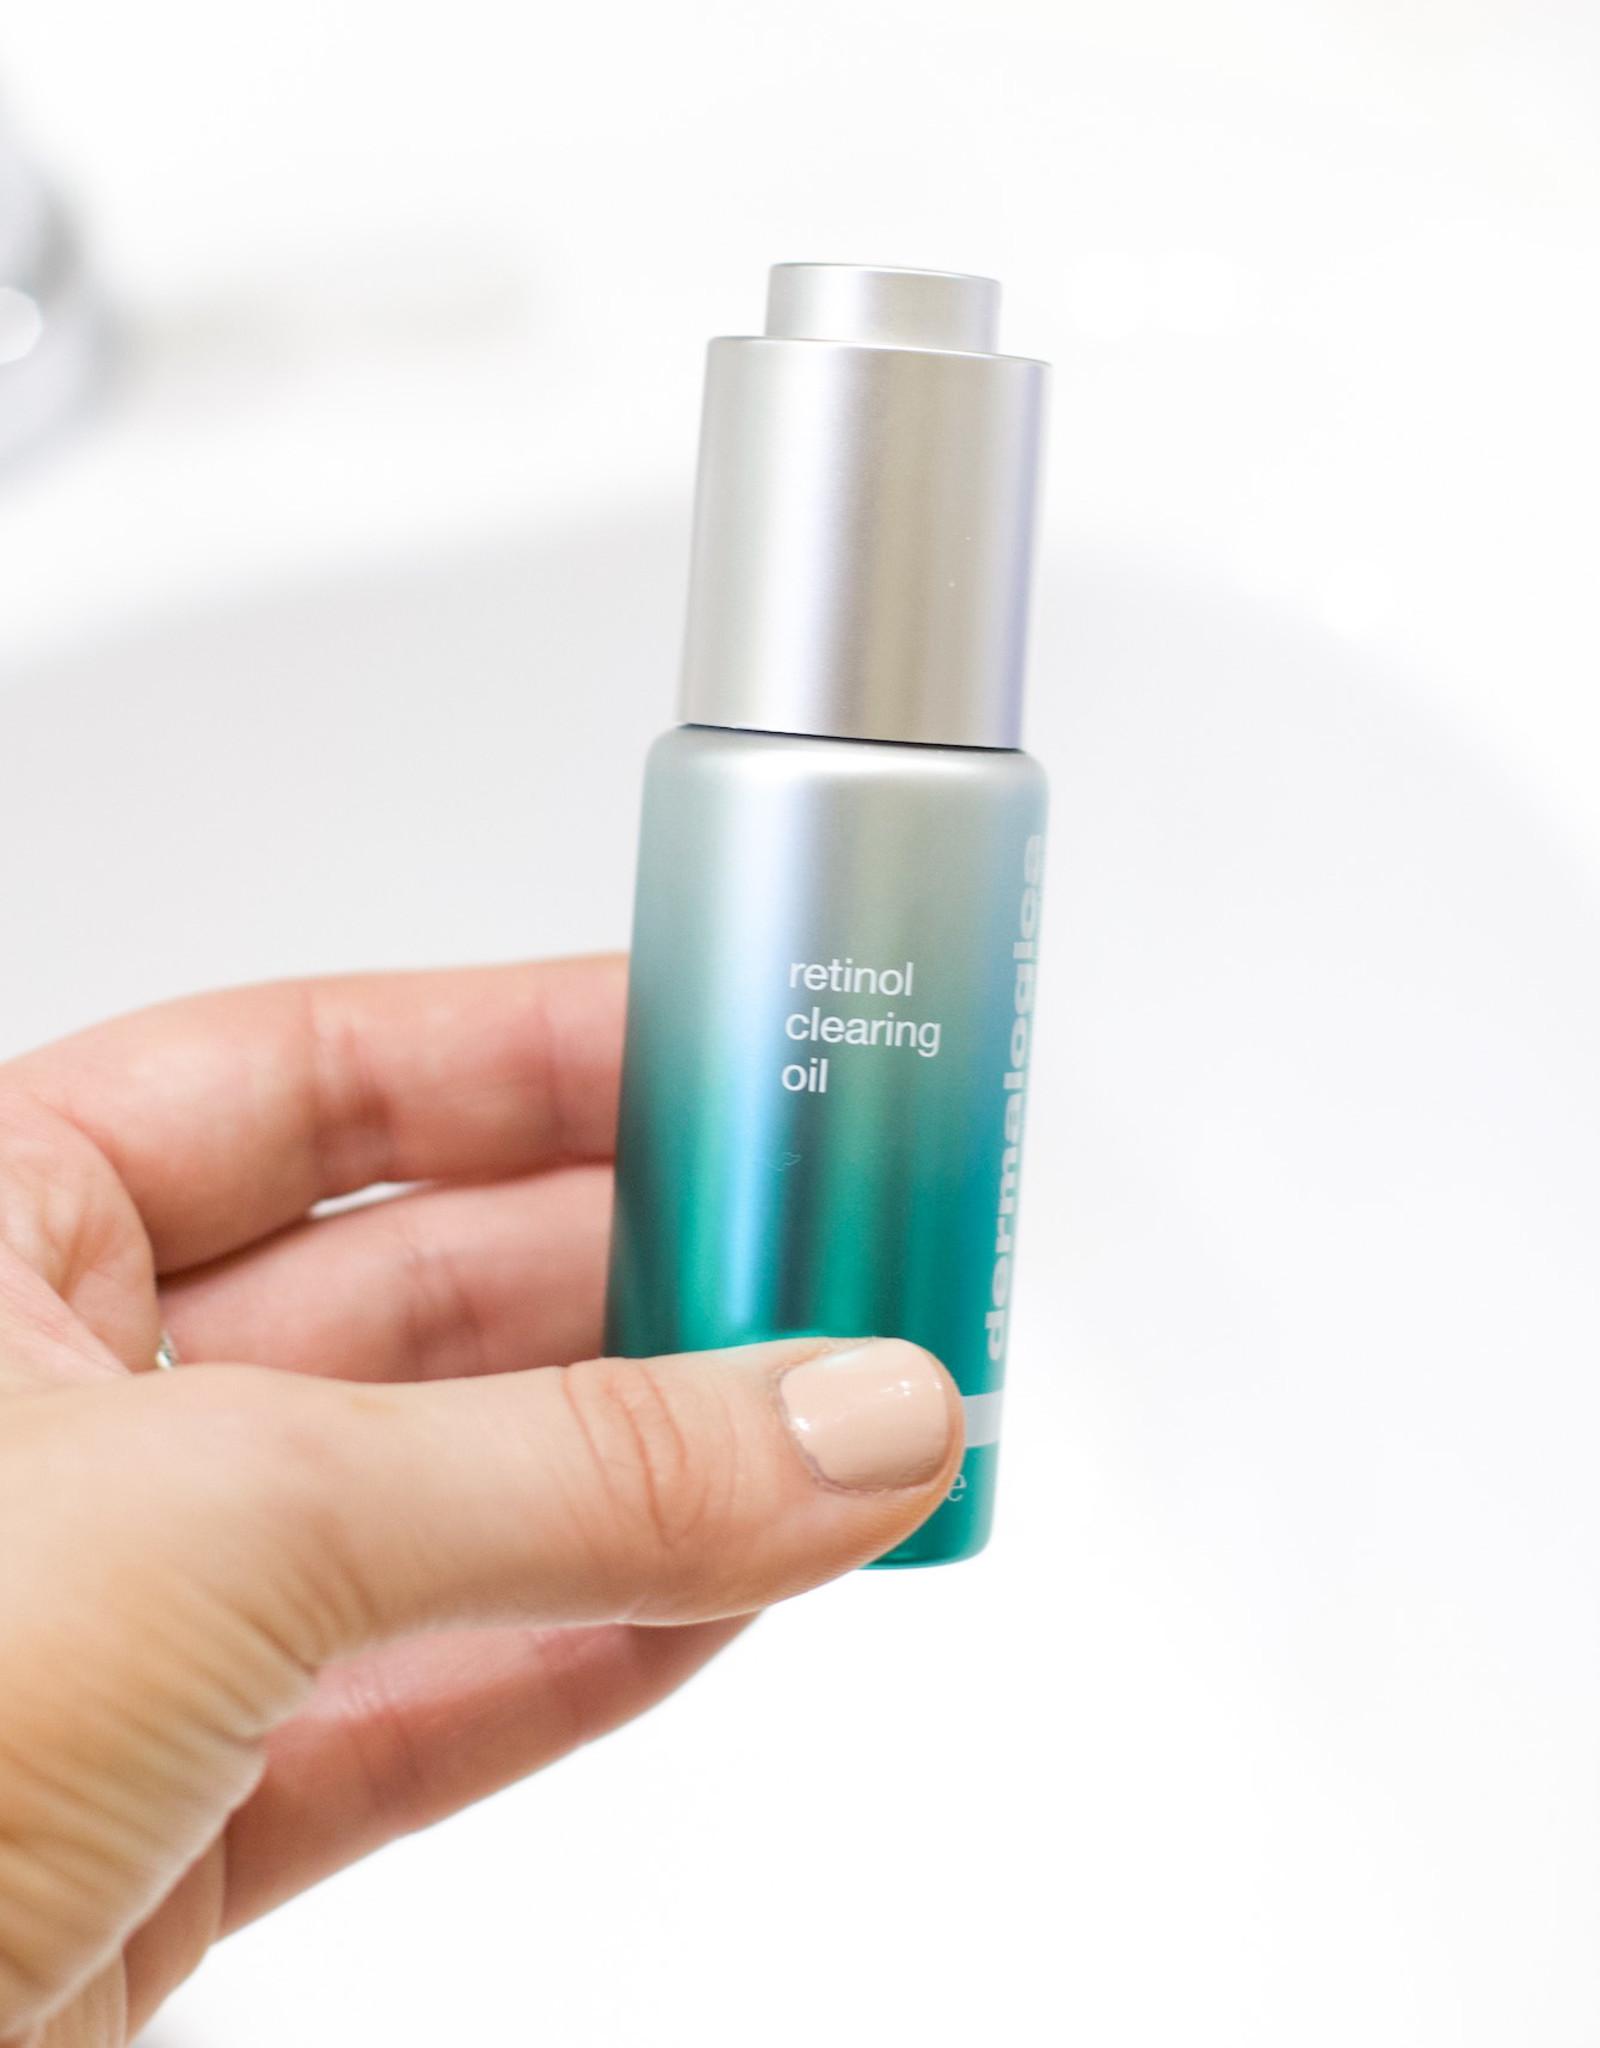 Dermalogica Active Clearing - Retinol Clearing Oil 30 ml - Dermalogica